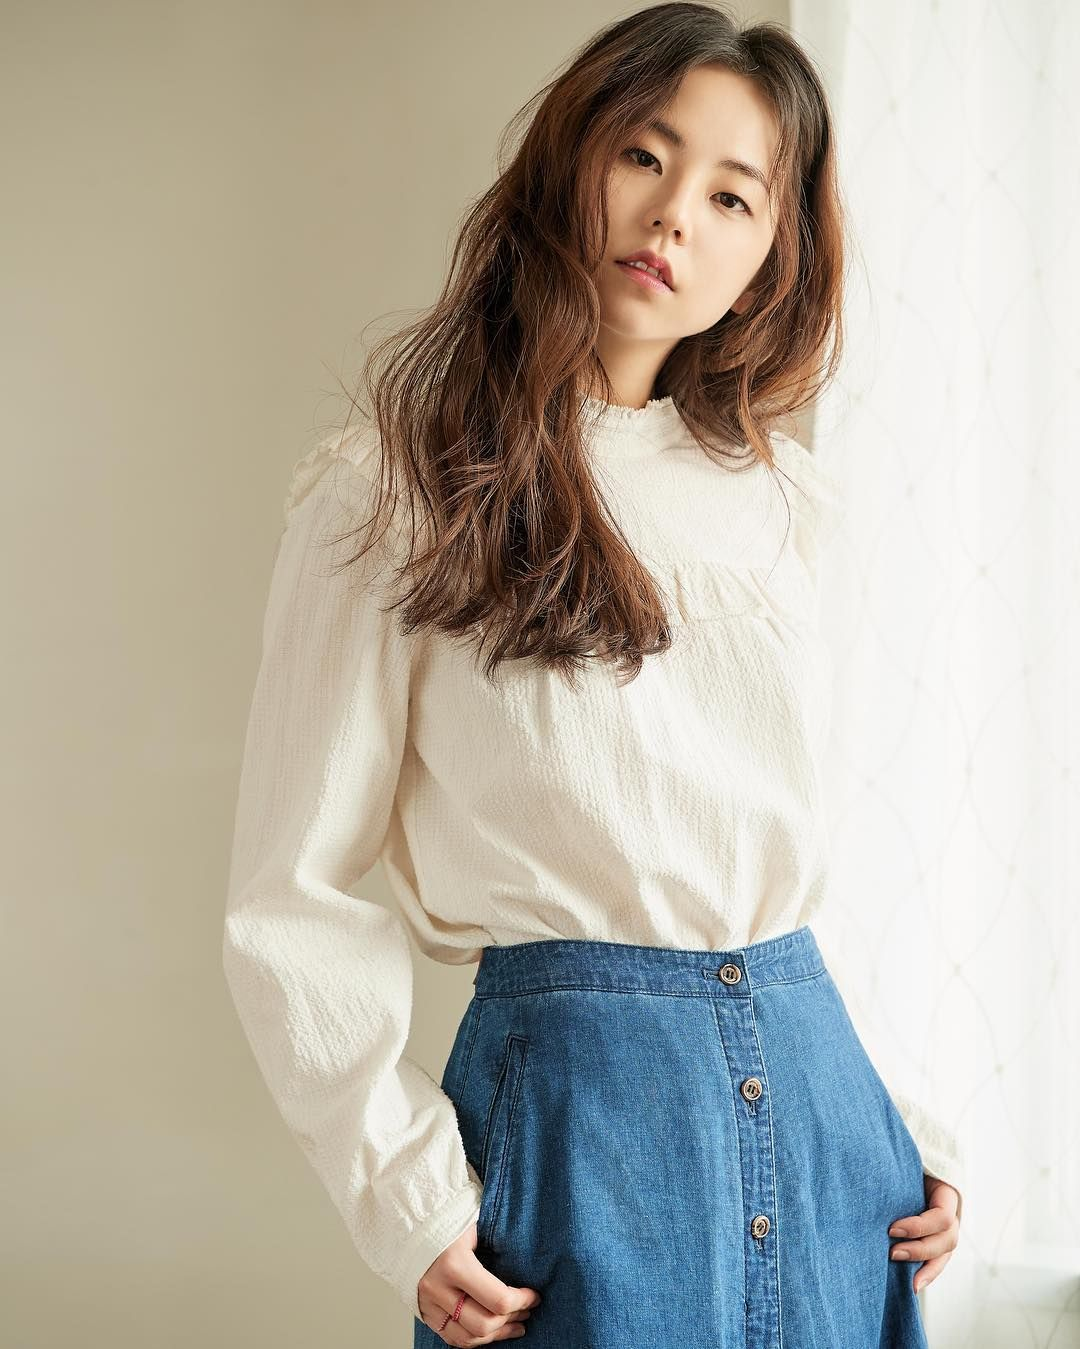 ahn sohee | Sohee wonder girl